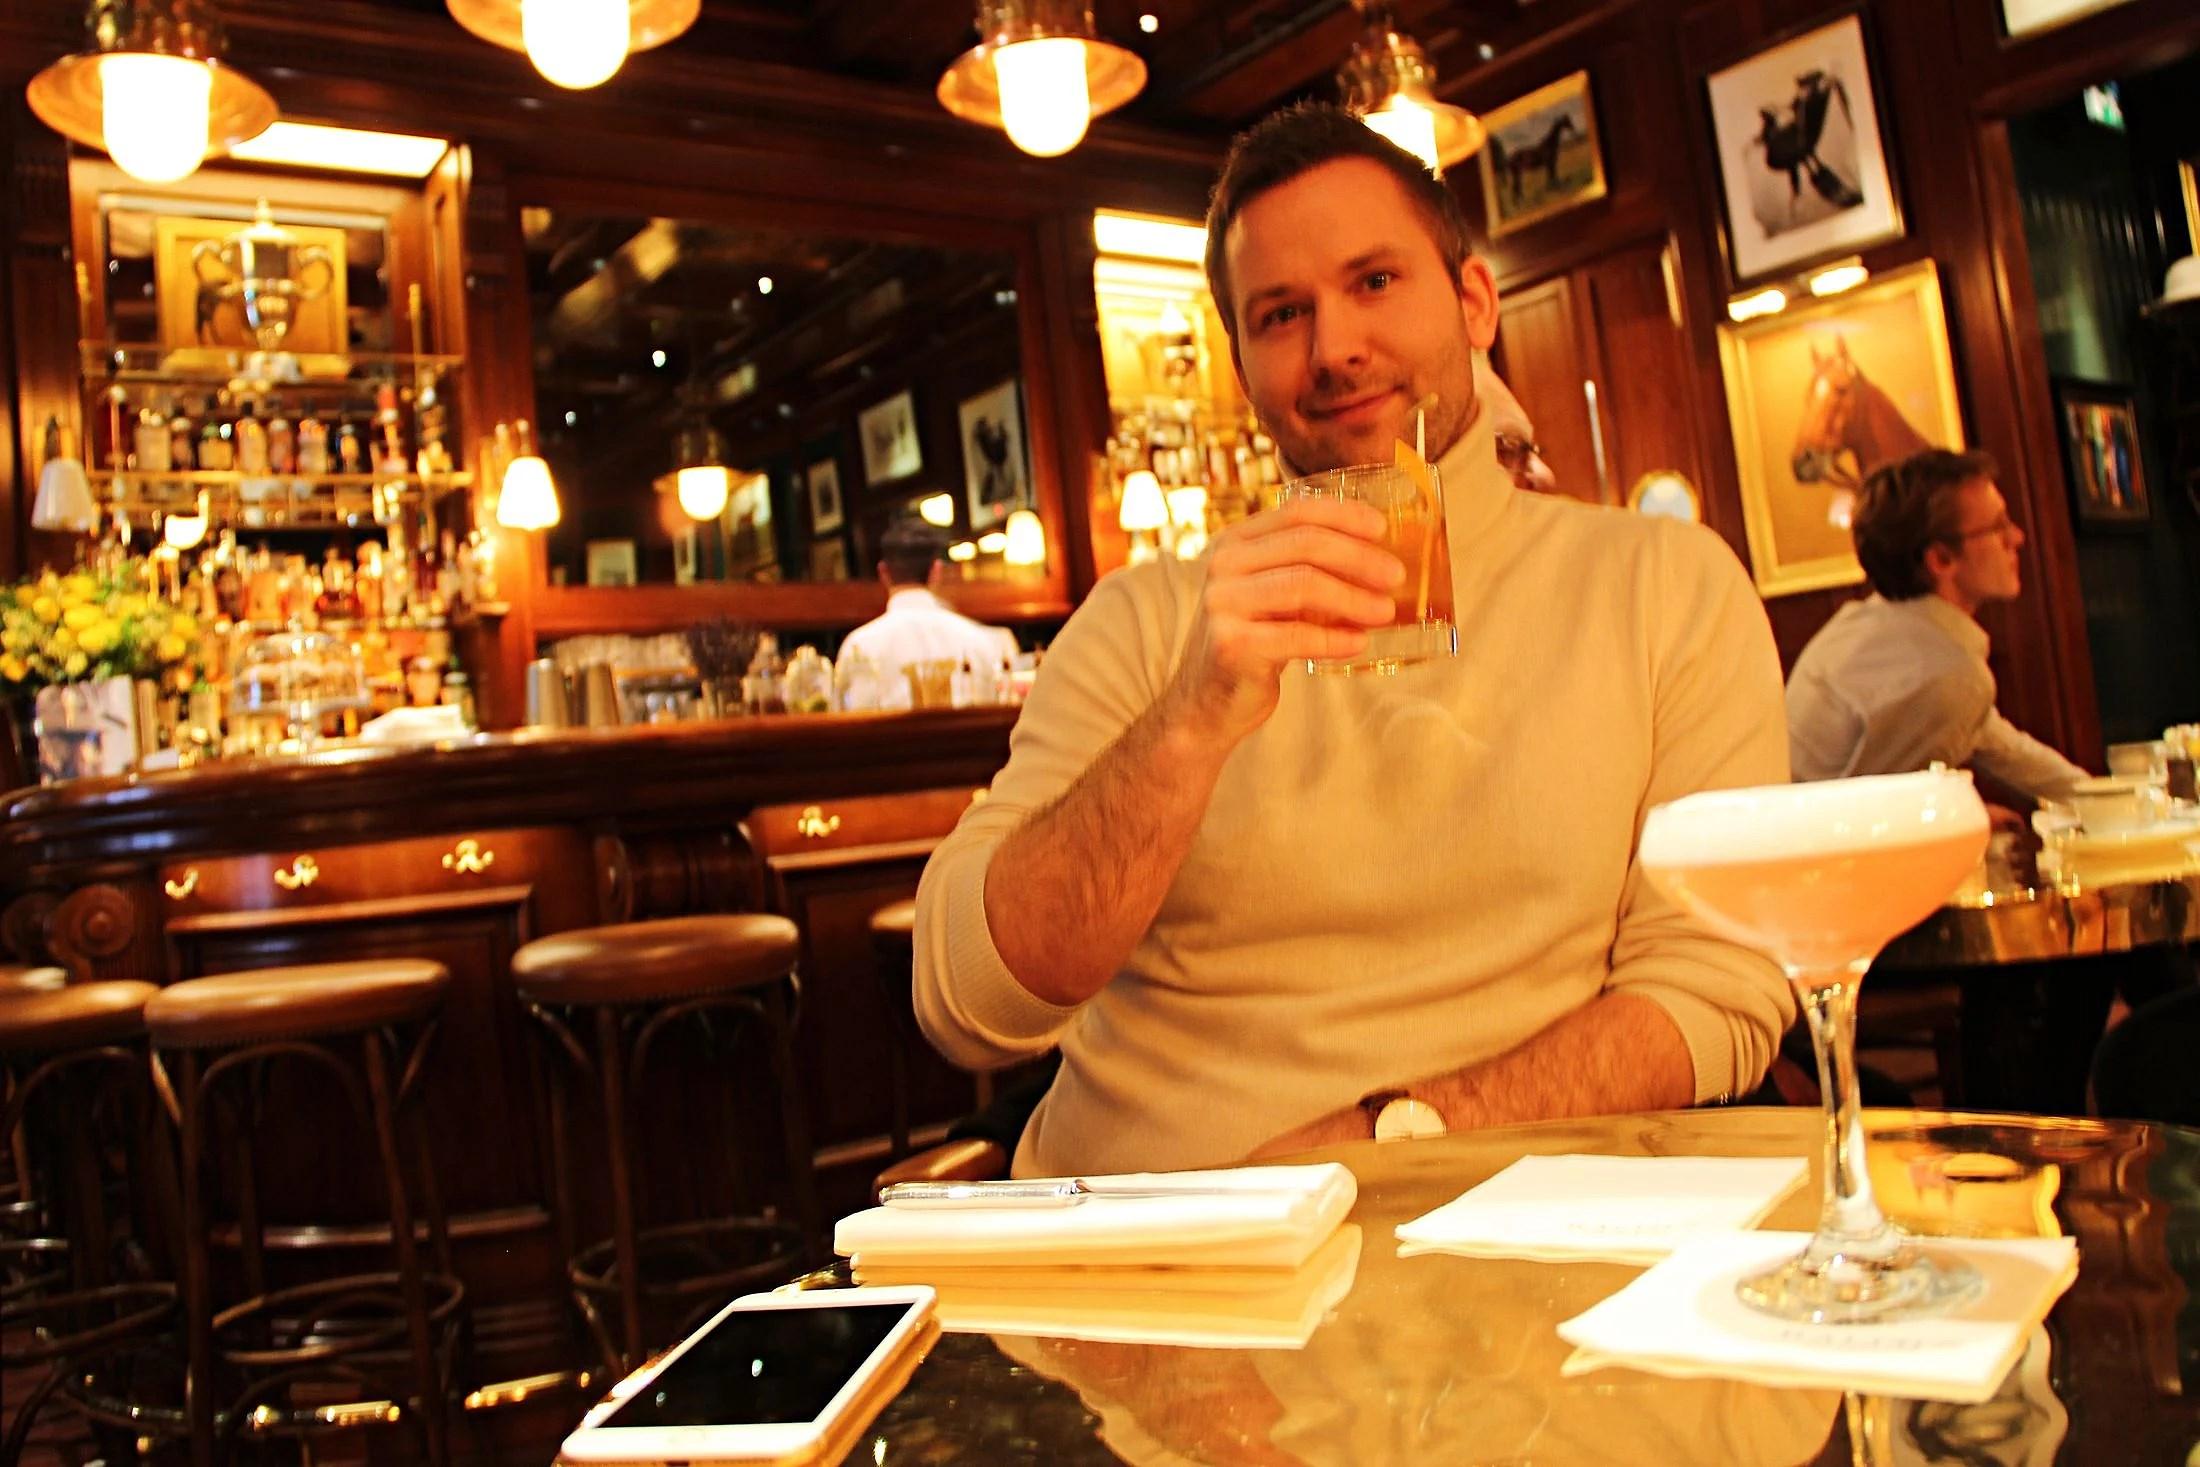 Ralph's Coffe & Bar